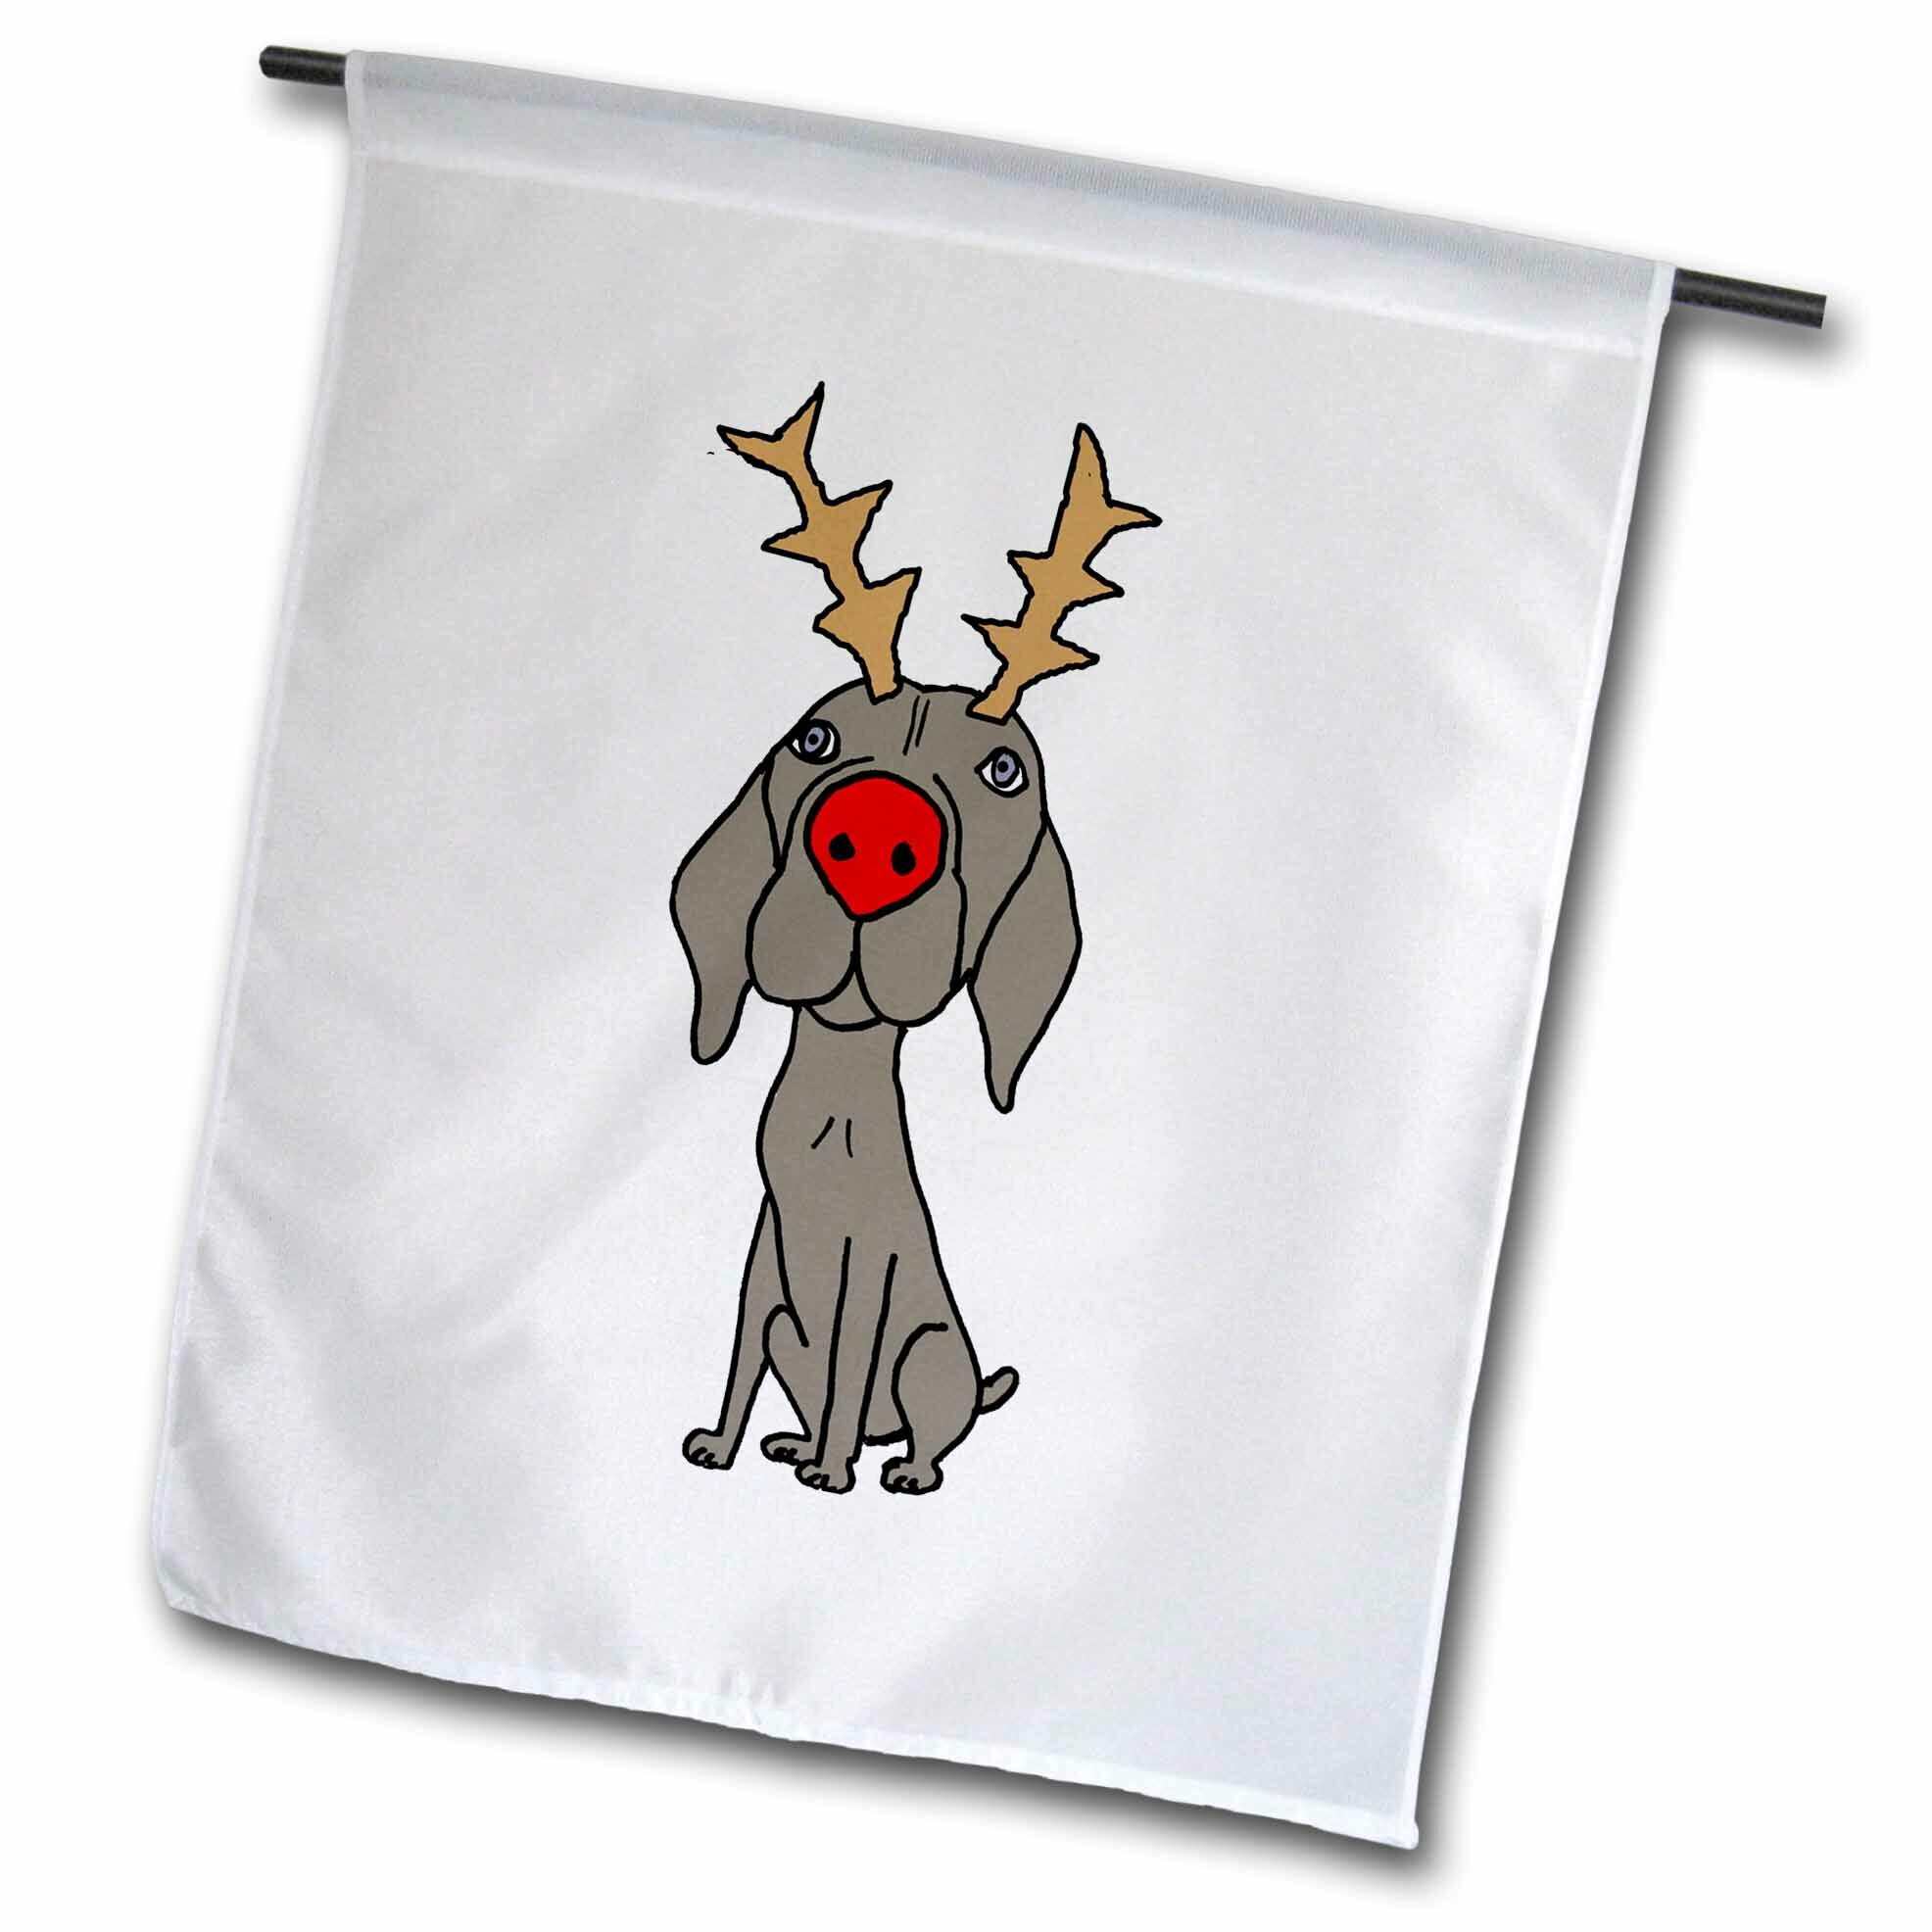 3drose Cute Funny Weimaraner Dog With Reindeer Antlers Christmas Polyester 18 X 12 In Garden Flag Wayfair